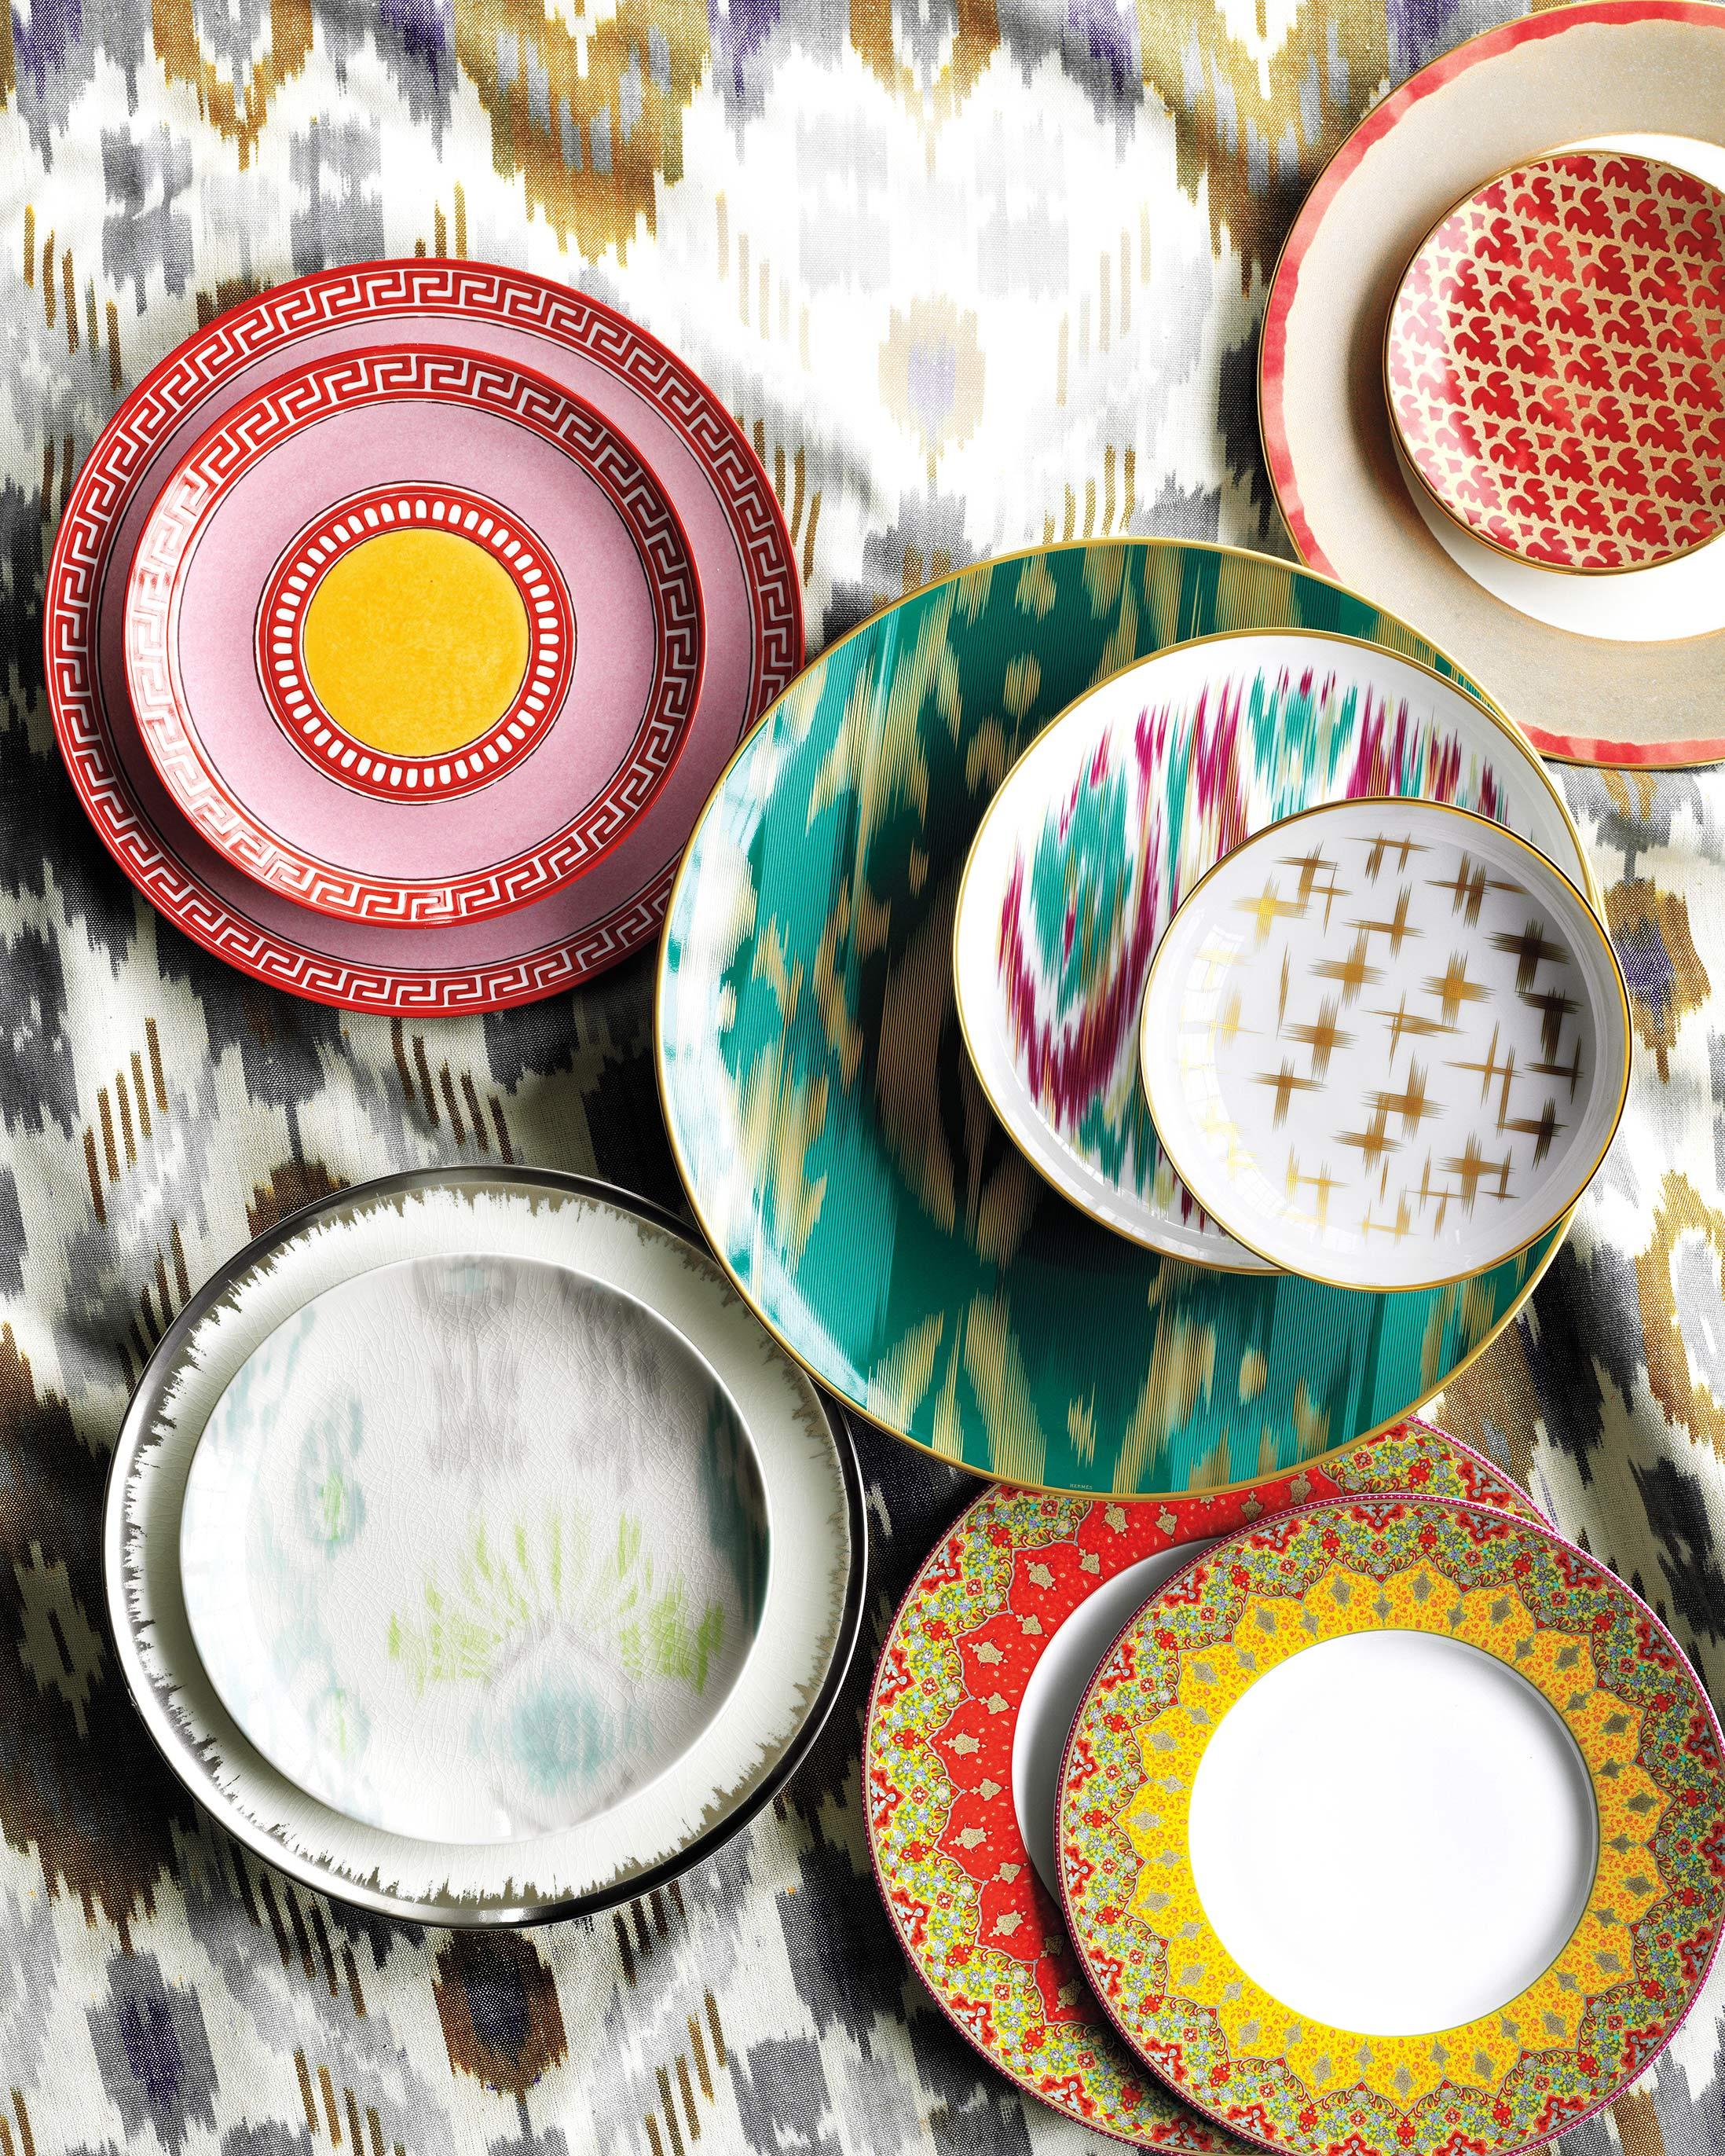 mglobal-print-colorful-patterns-v2-05-d112735.jpg